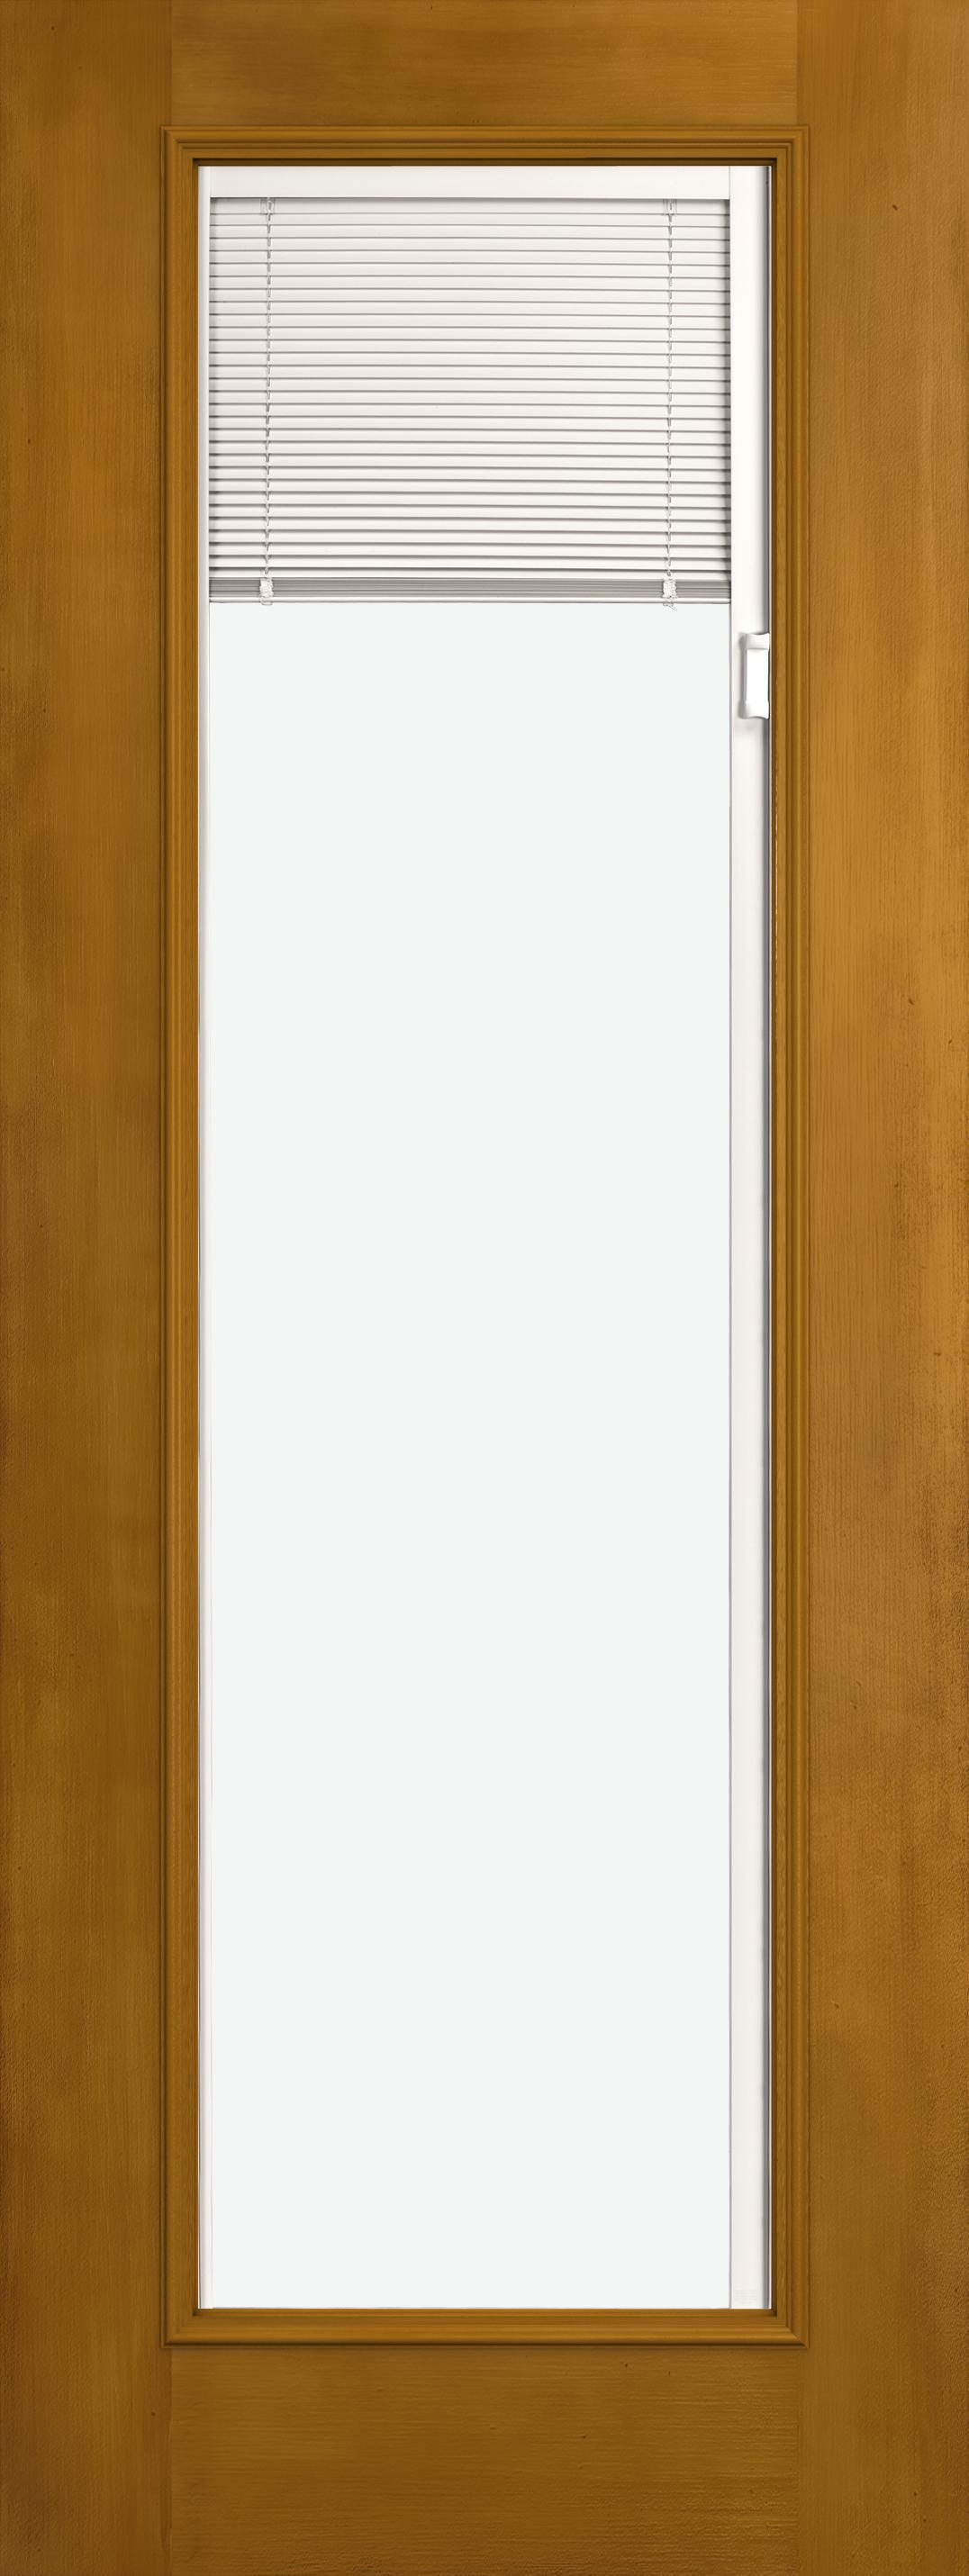 Design Pro Fiberglass Exterior Doors 8ft Fir Full View Blinds Glass Panel Reliable And Energy Efficient Doors And Windows Jeld Wen Windows Doors